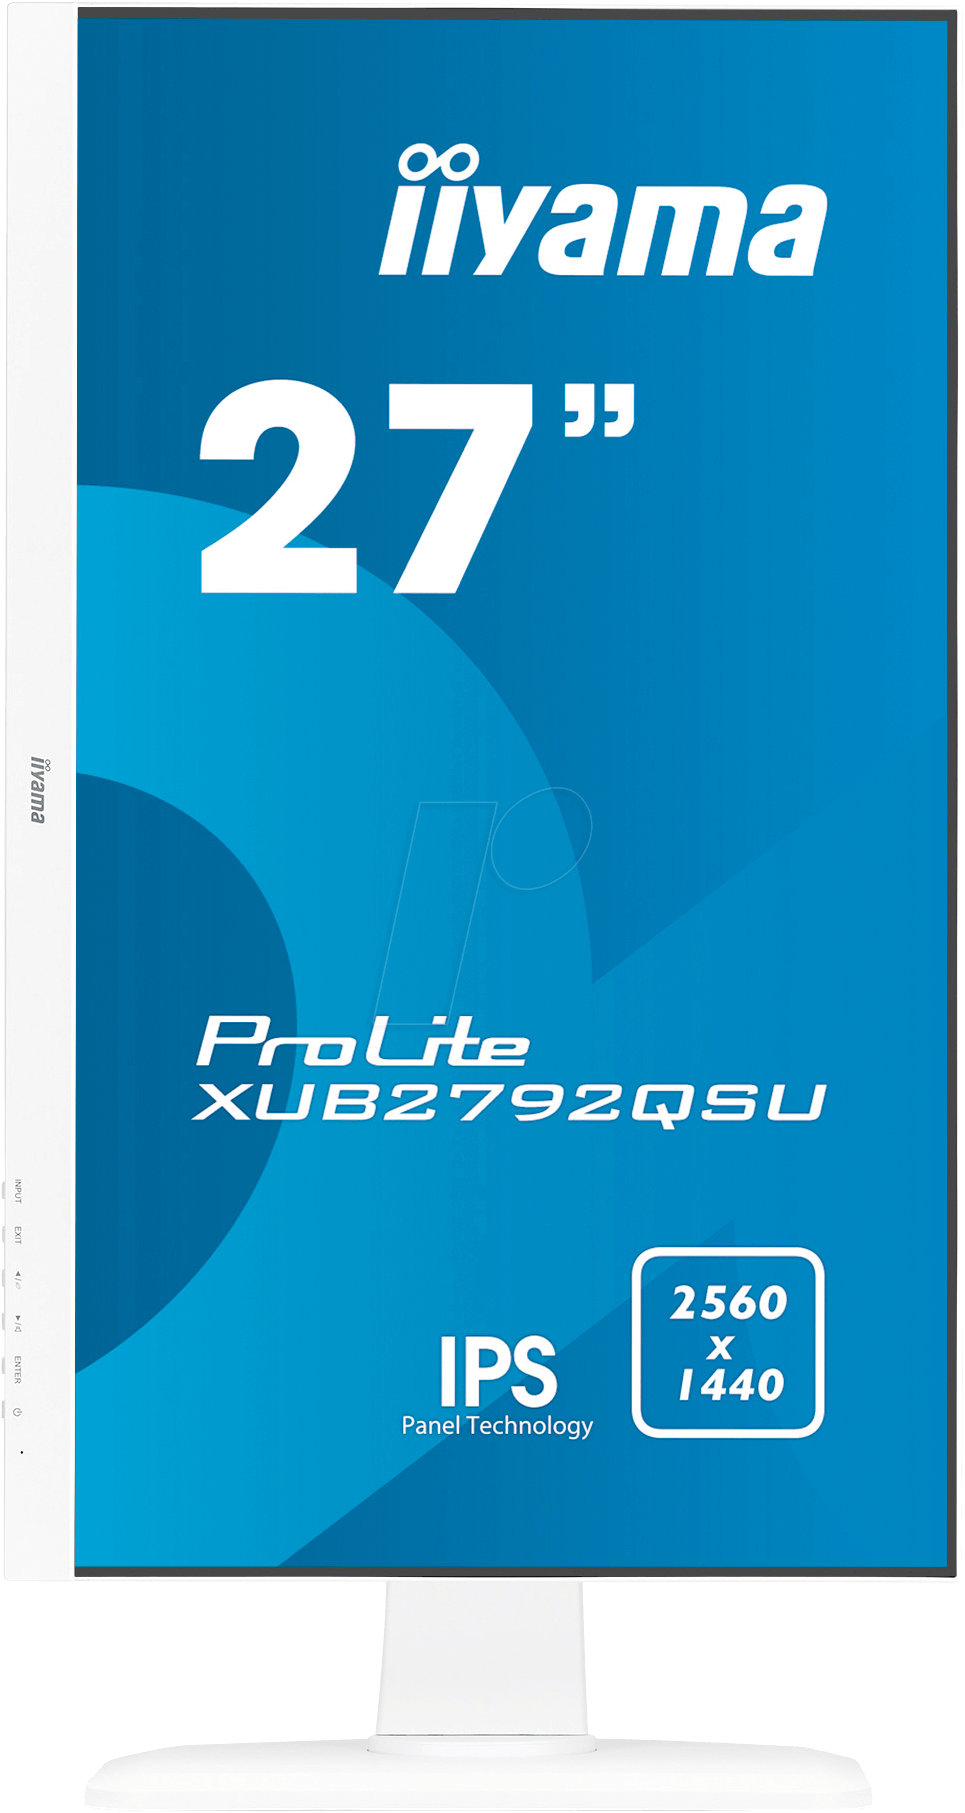 Iiyama IIY XUB2792QSUW1 69cm Monitor, Lautsprecher, Pivot